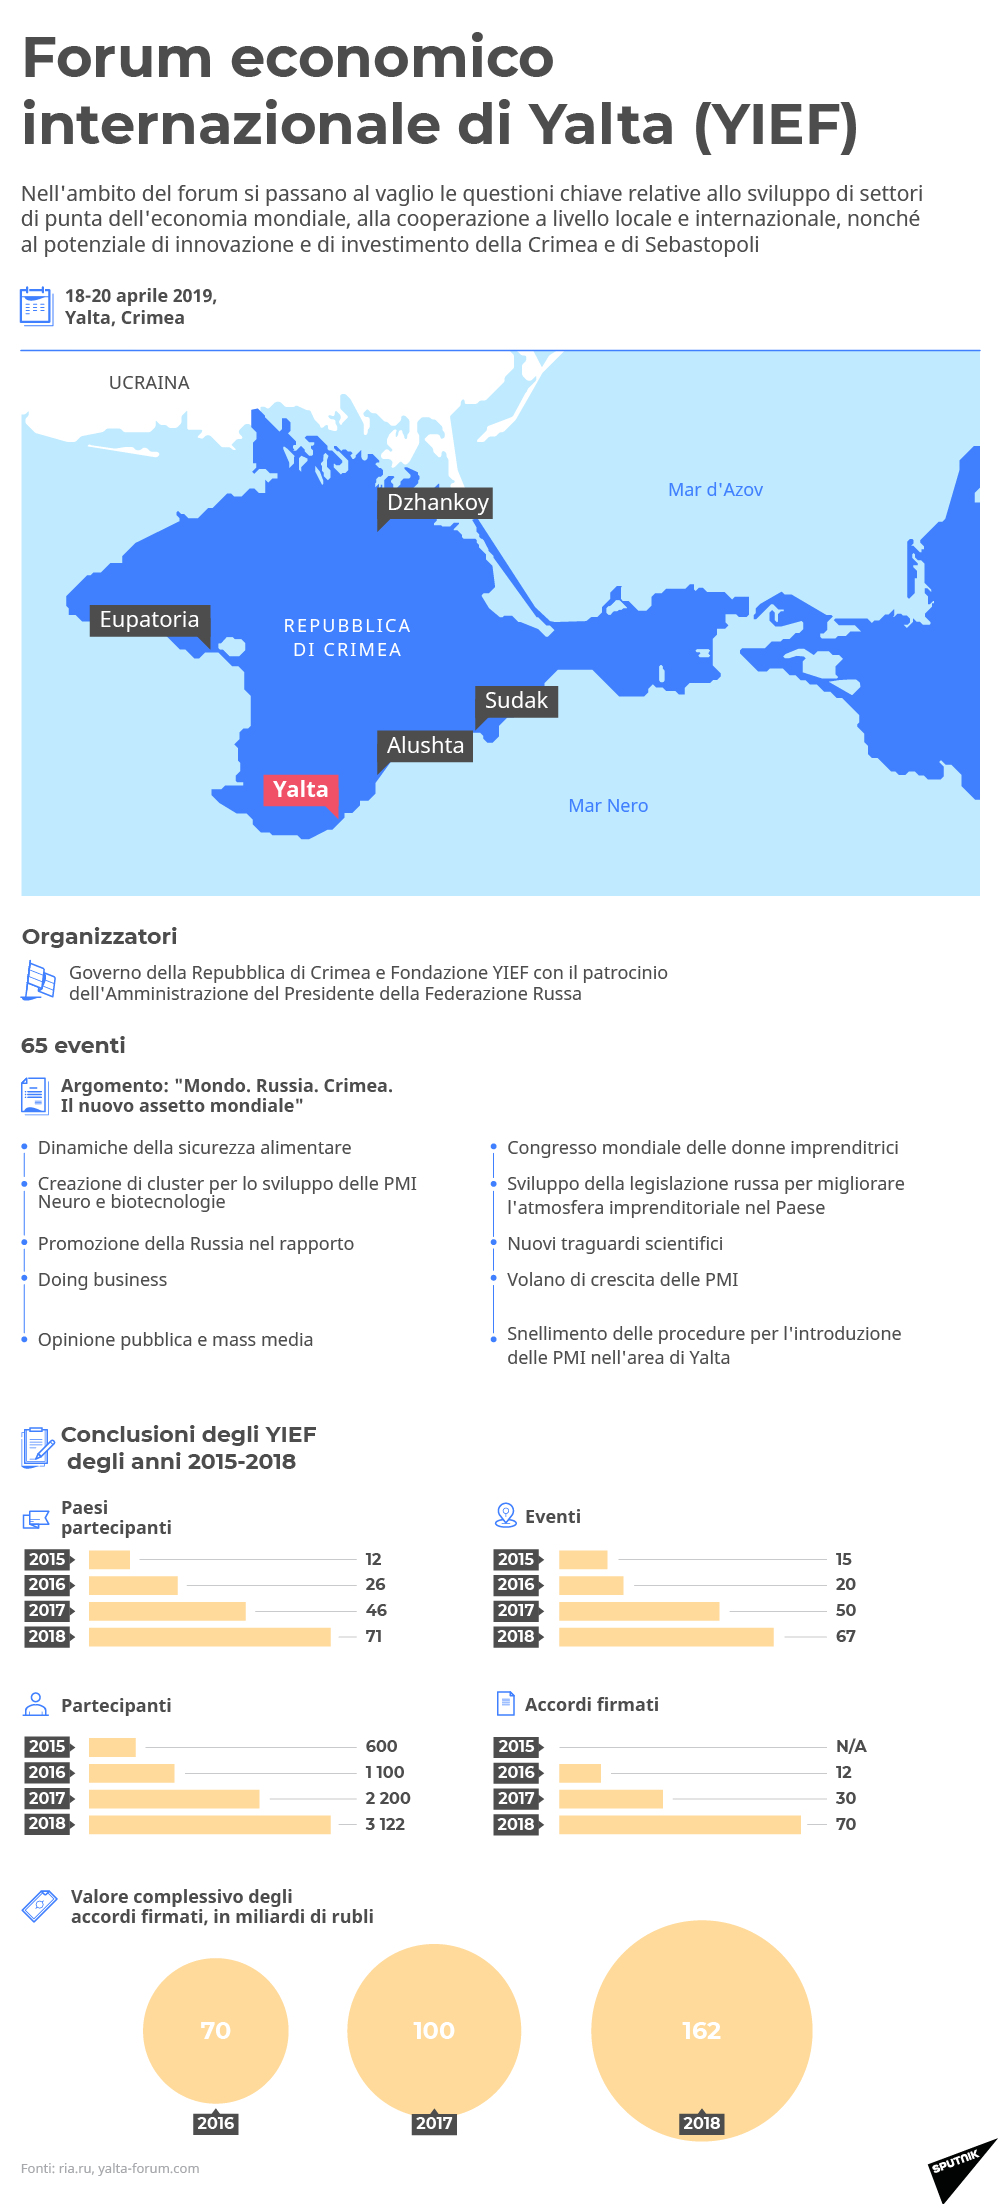 Forum economico internazionale di Yalta (YIEF) - Sputnik Italia